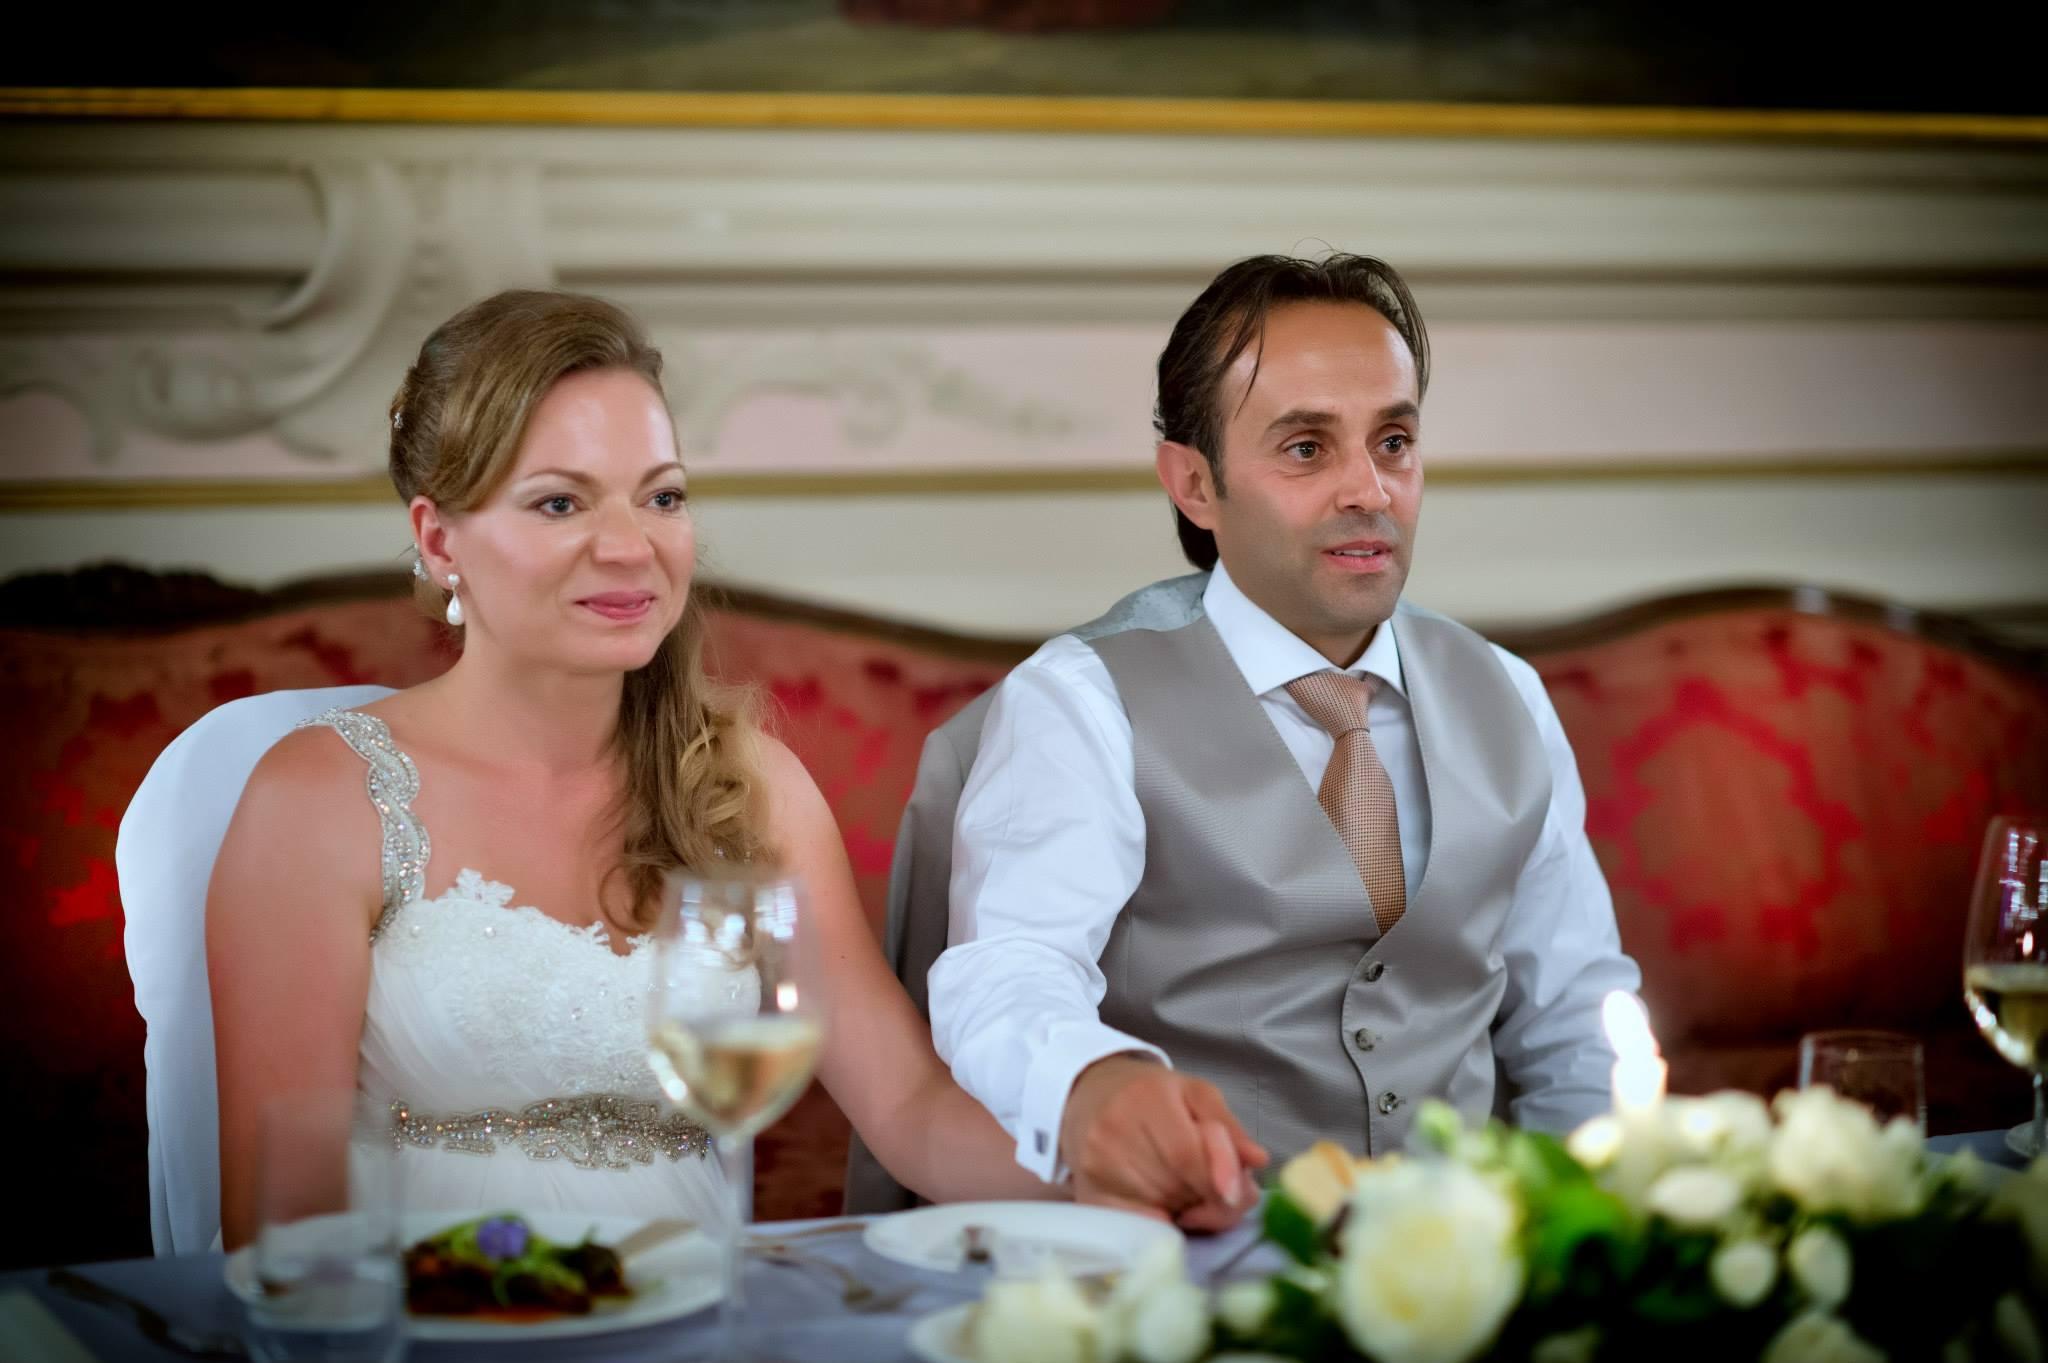 mariage venise luna baglioni bauer photographe gondole  wedding venice (29)